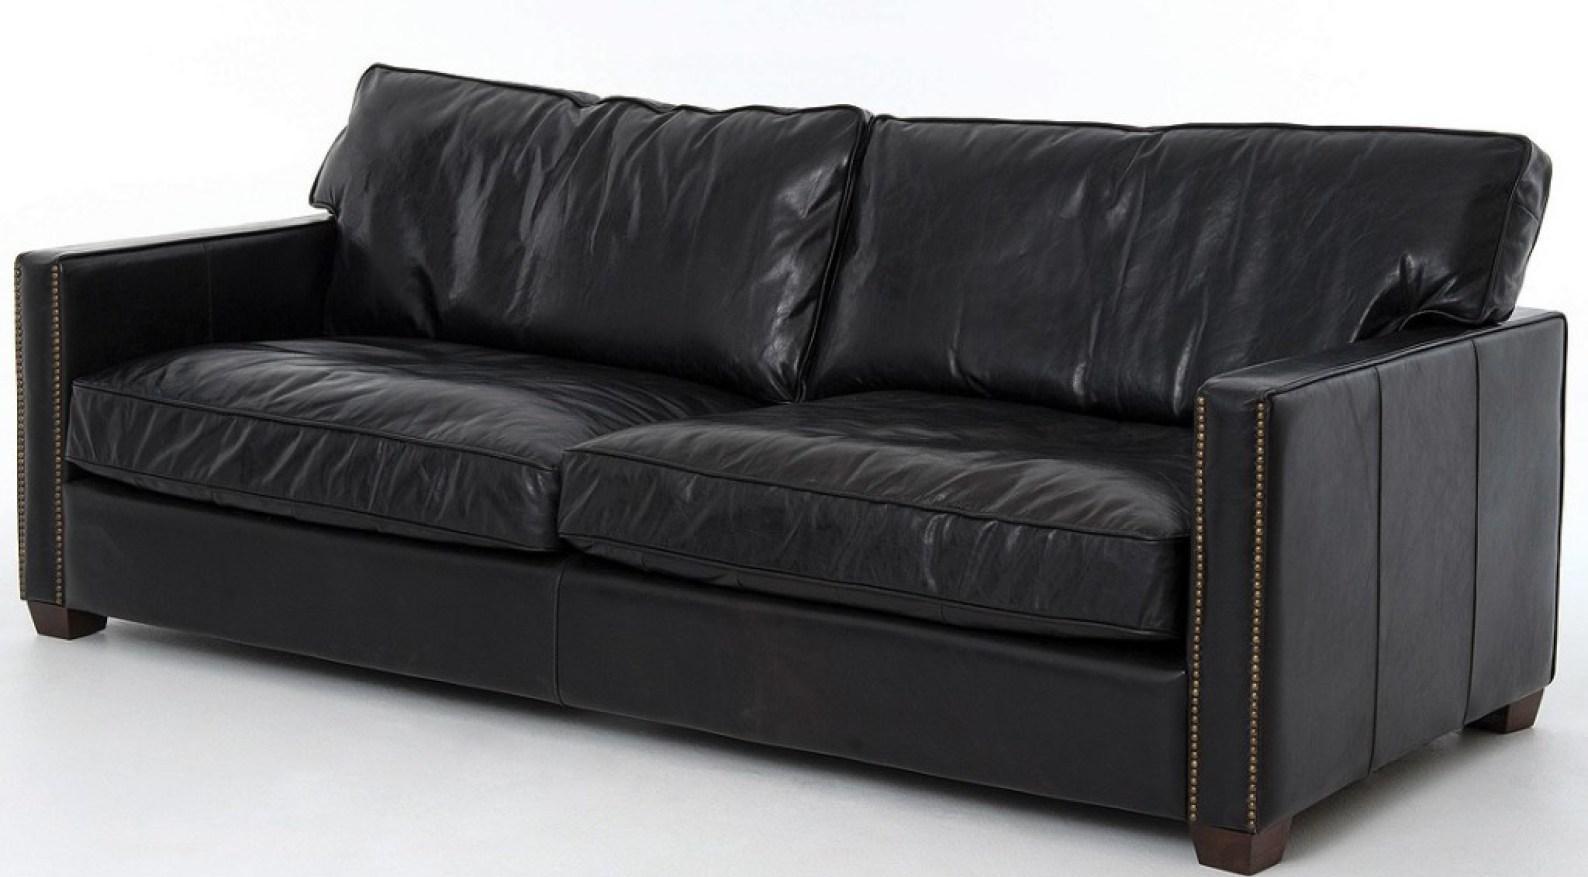 Entertain Impression Big Sofa Shares Suitable Luxe Sofa Slipcover With Regard To Unique Corner Sofas (Image 5 of 21)